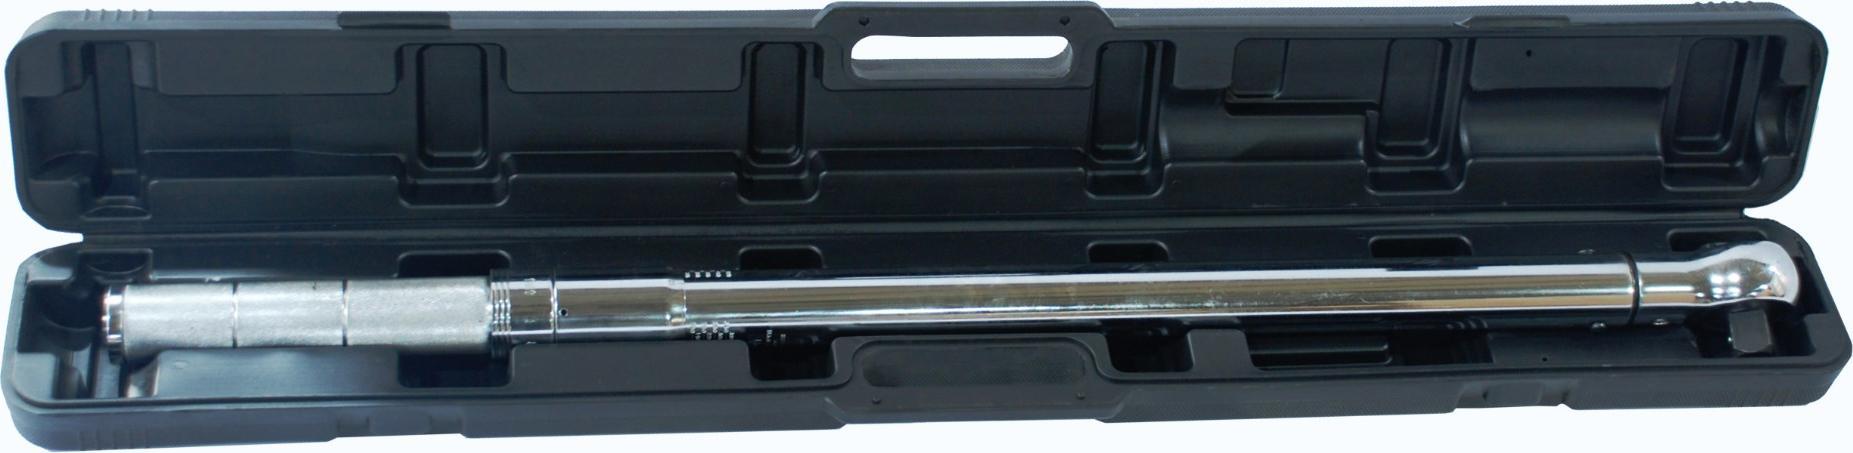 Ключ динамометрический Mhrtools Mhr-b0800-34